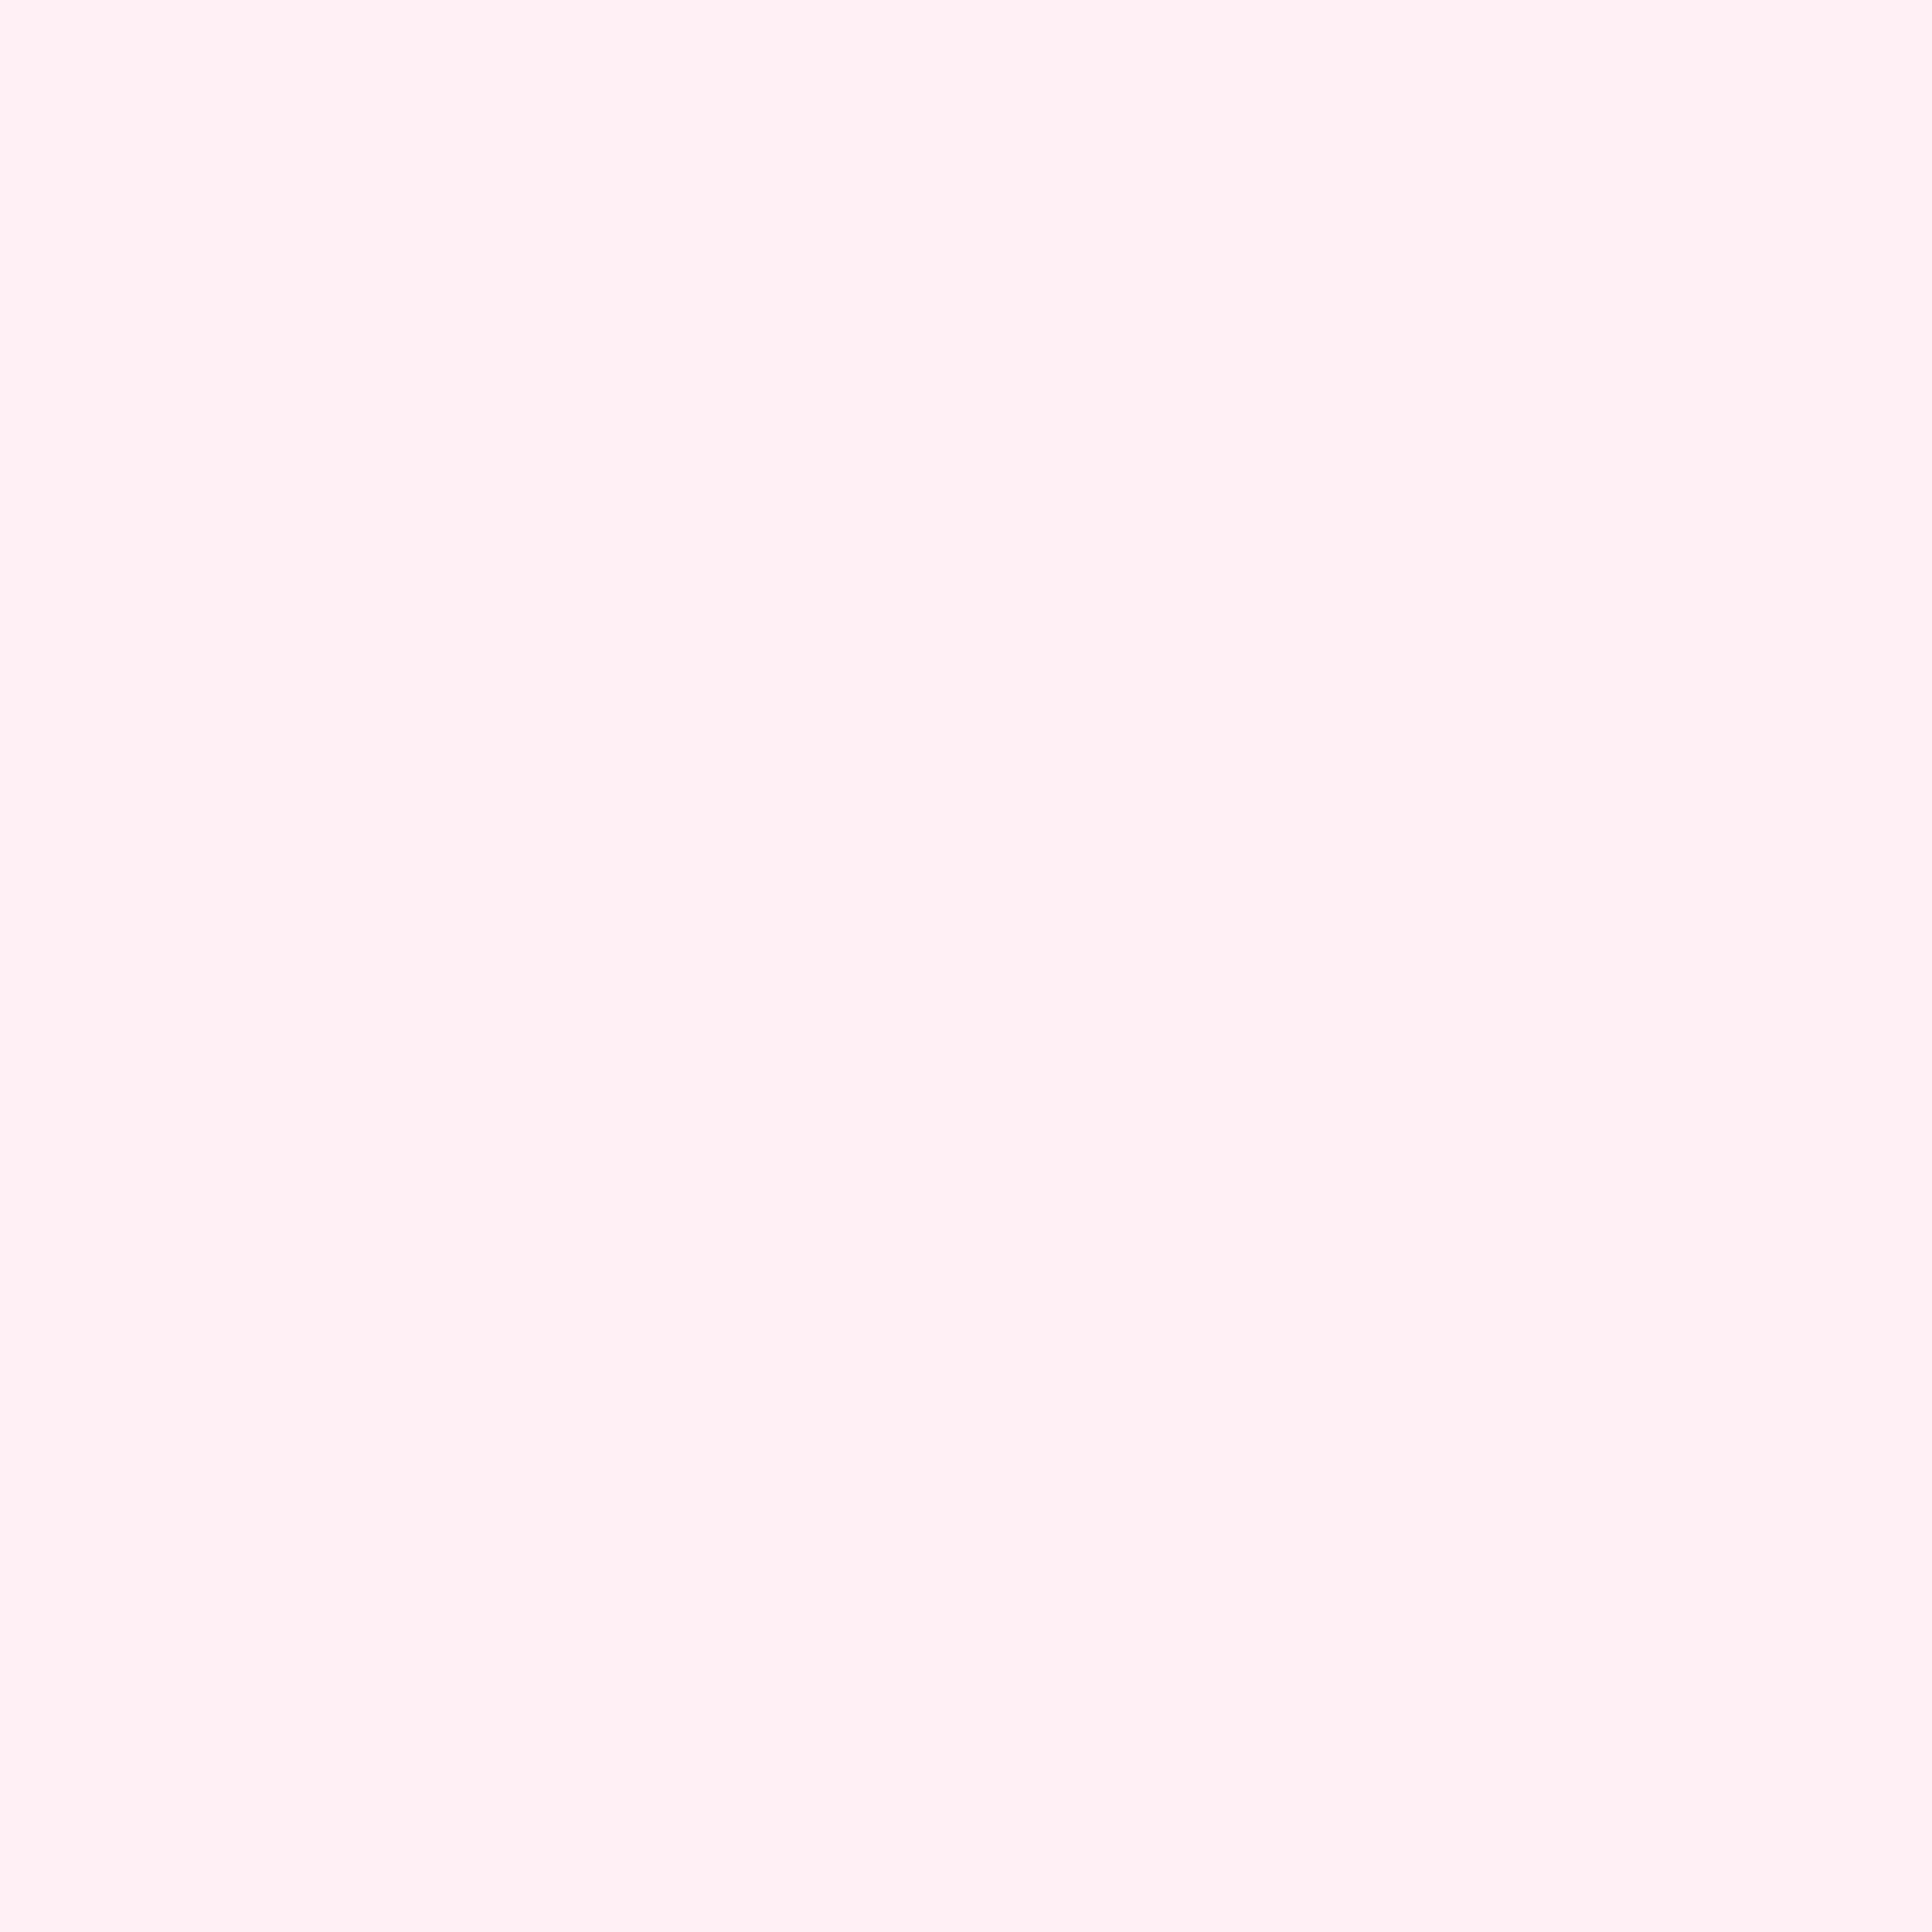 2048x2048 Lavender Blush Solid Color Background